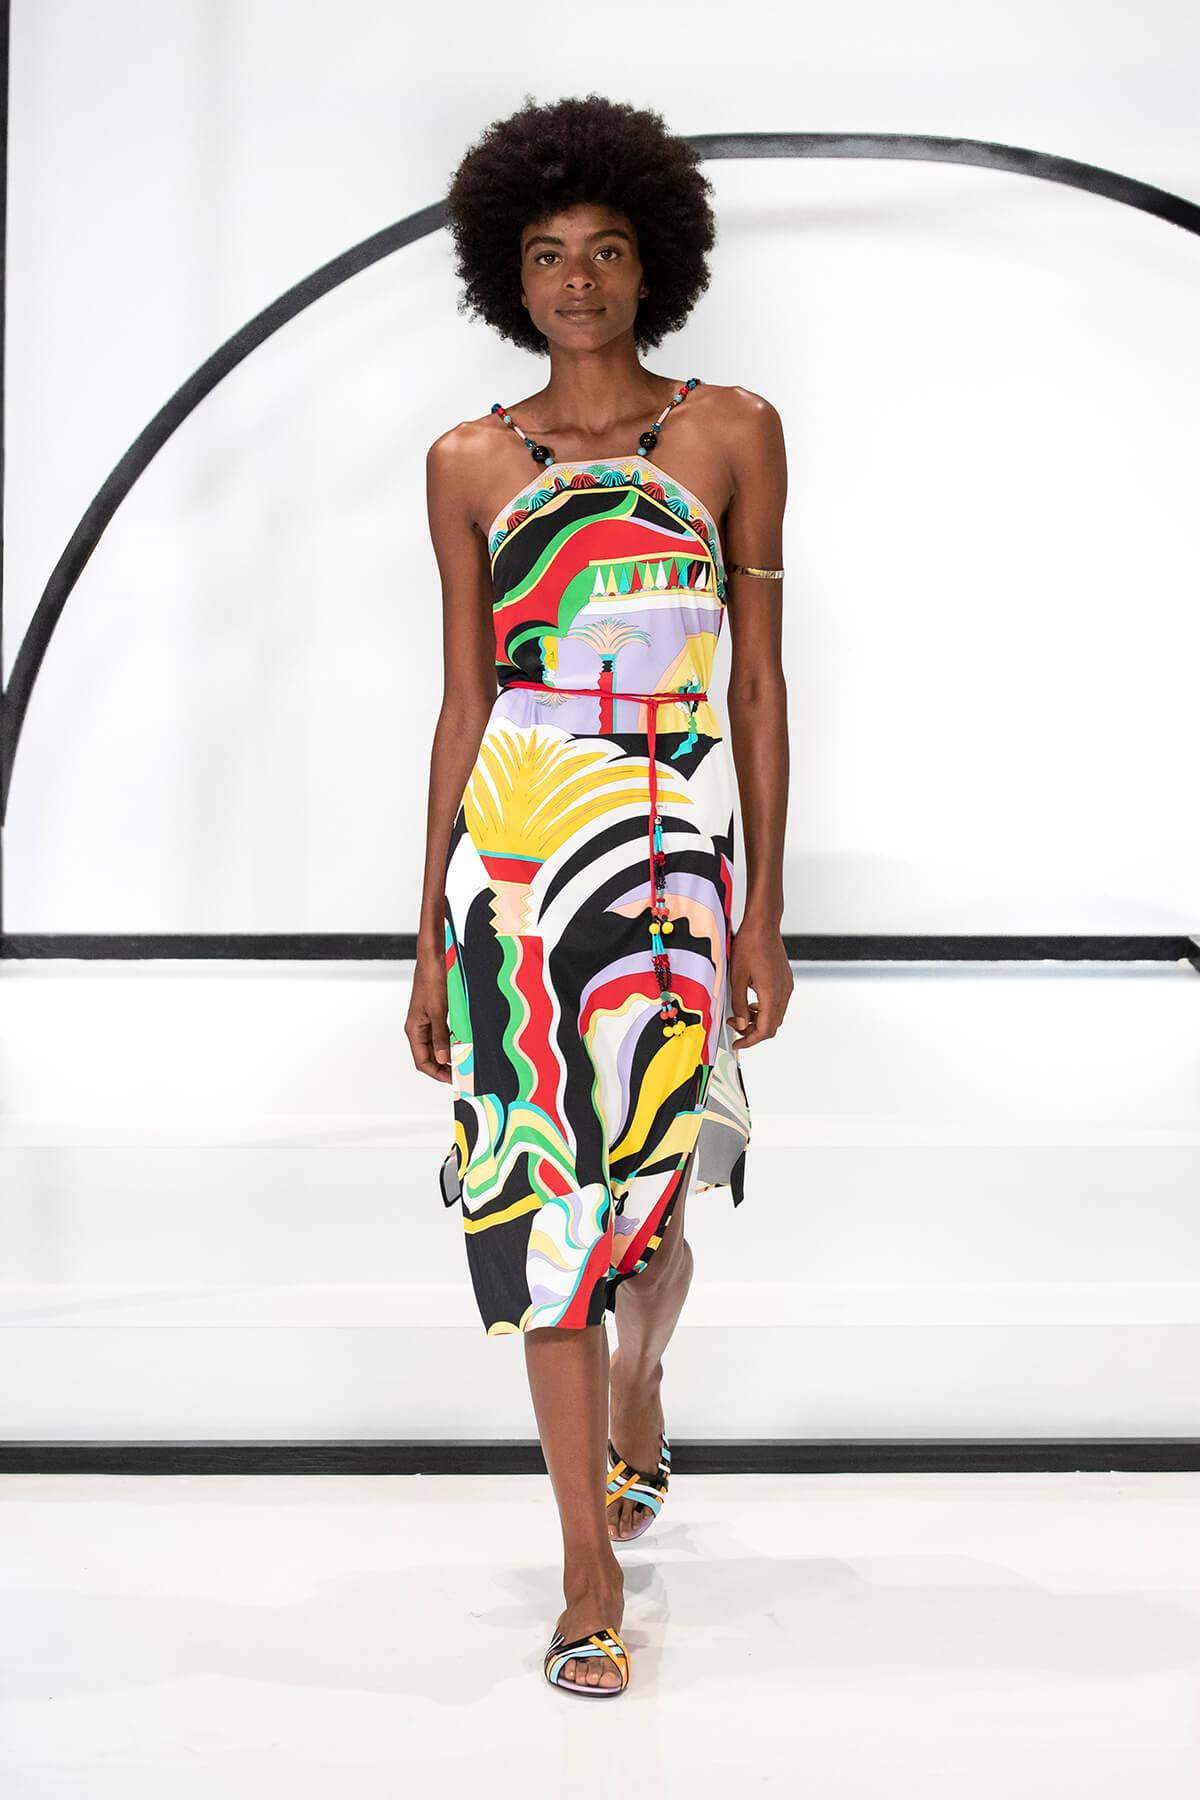 Model on catwalk wearing a colourful summer dress